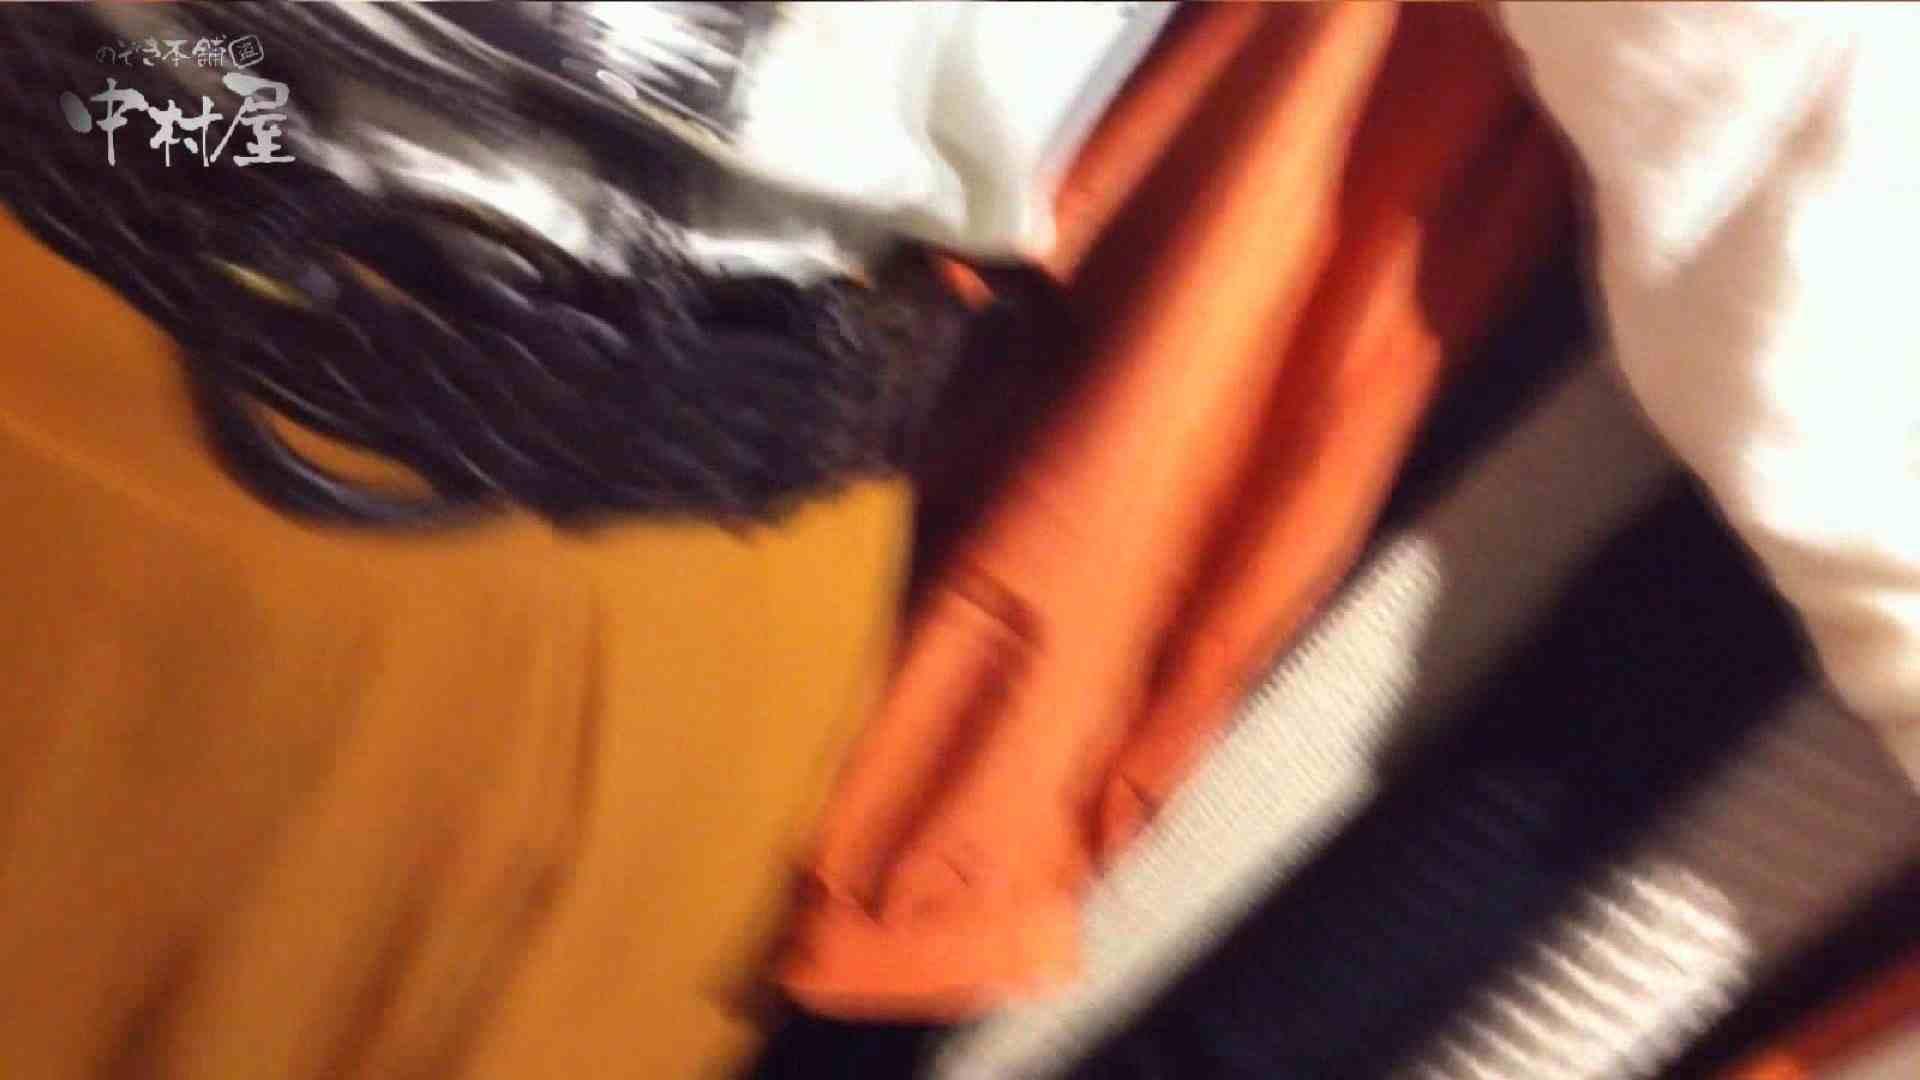 vol.83 美人アパレル胸チラ&パンチラ 赤Tバック店員さんいらっしゃい 美人 AV無料 94連発 52